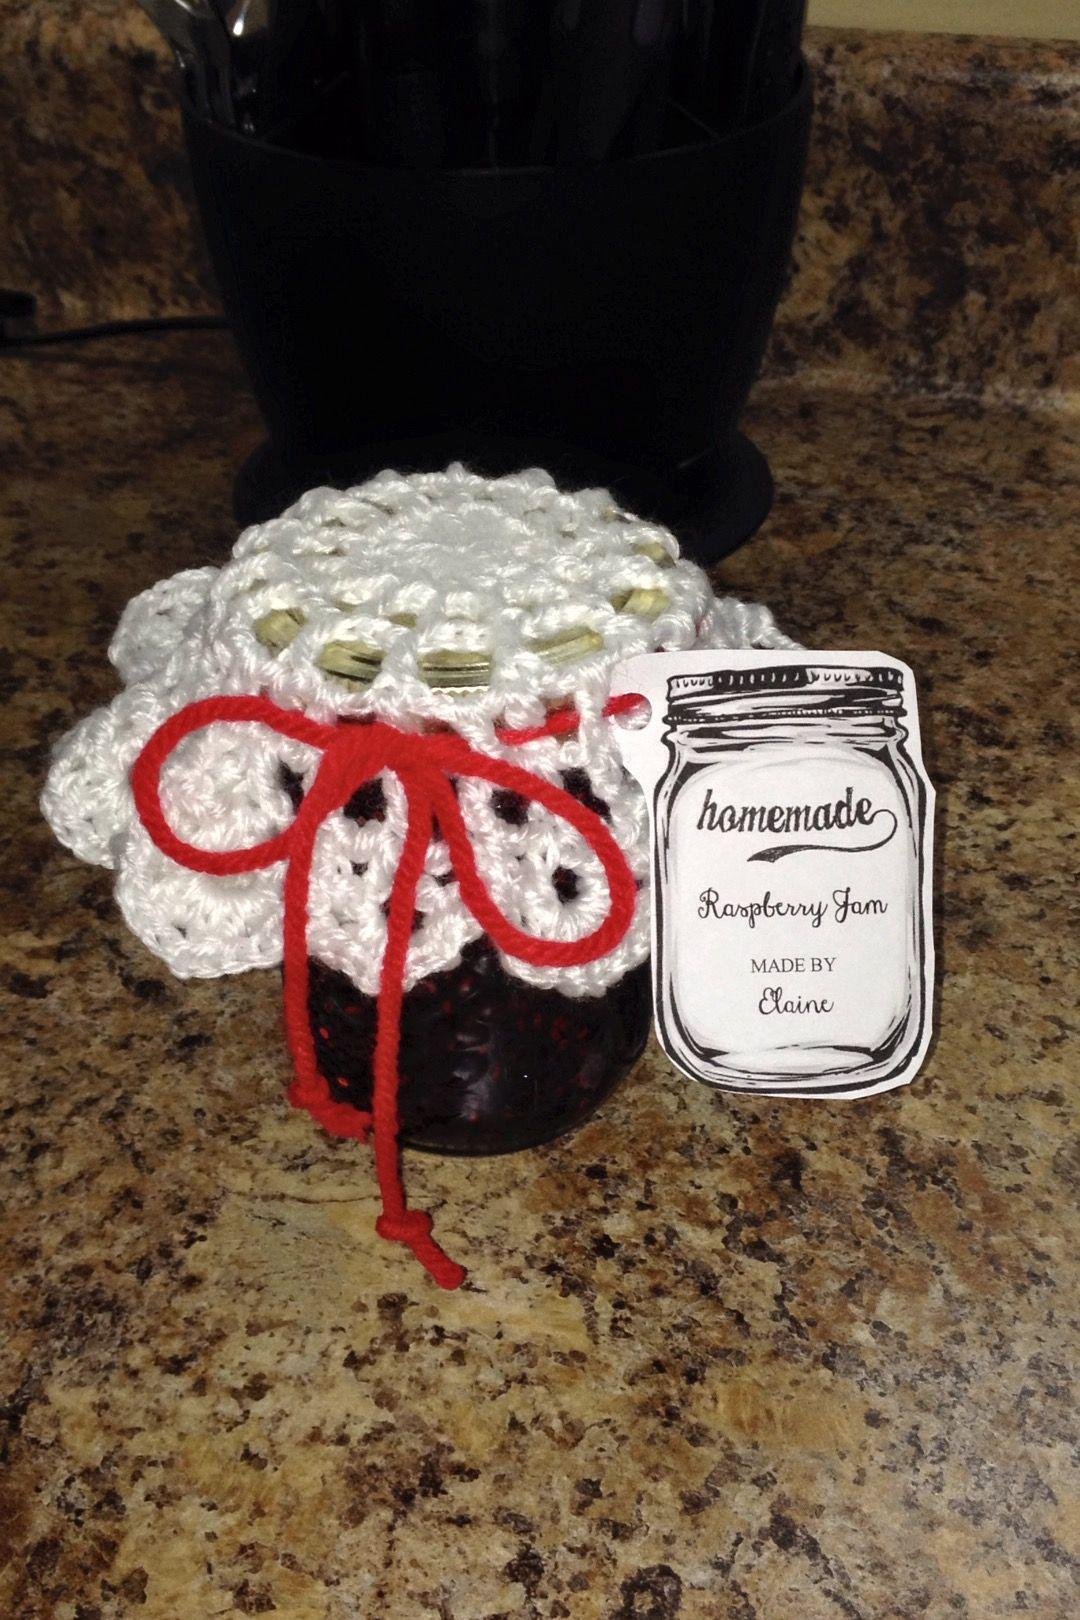 Homemade jam and crochet doily jar topper. Free pattern: http://www ...